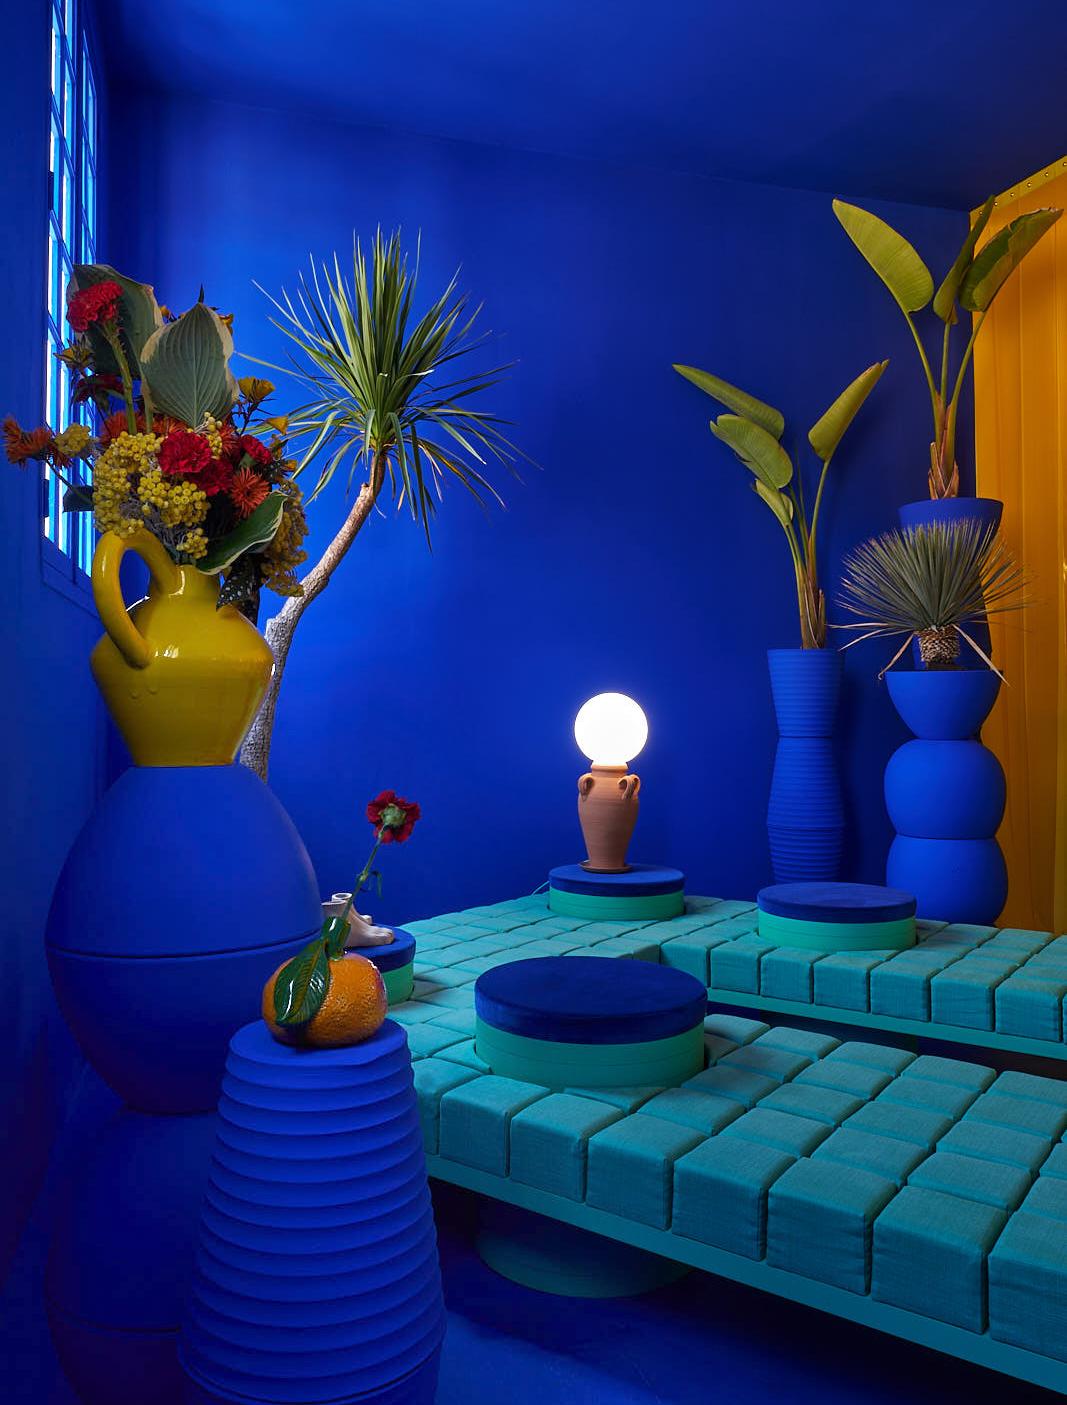 ilaria fatone inspirations - une installation artistique en bleu klein